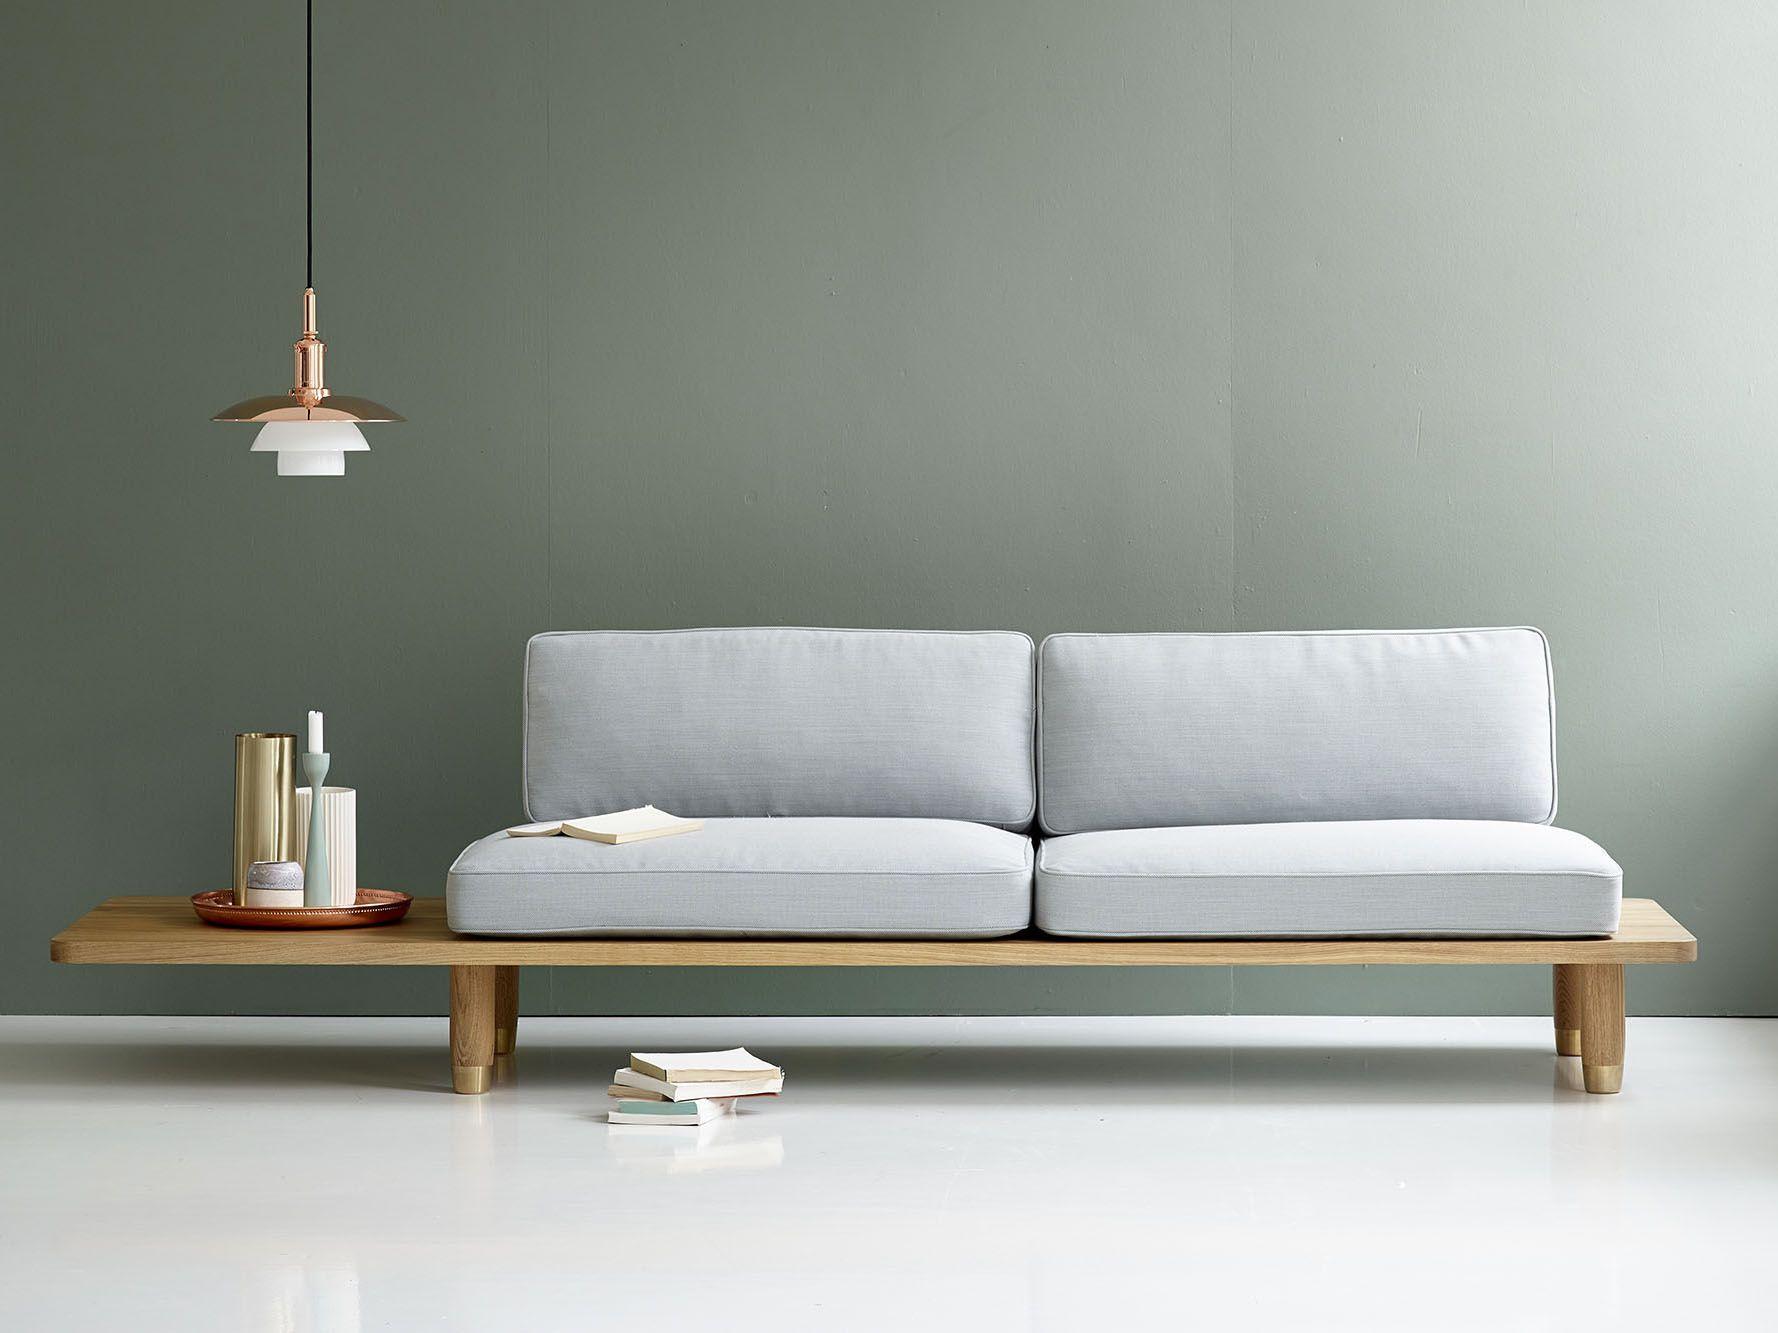 Plank Sofa Originado A Partir De Una Plancha De Madera Modern